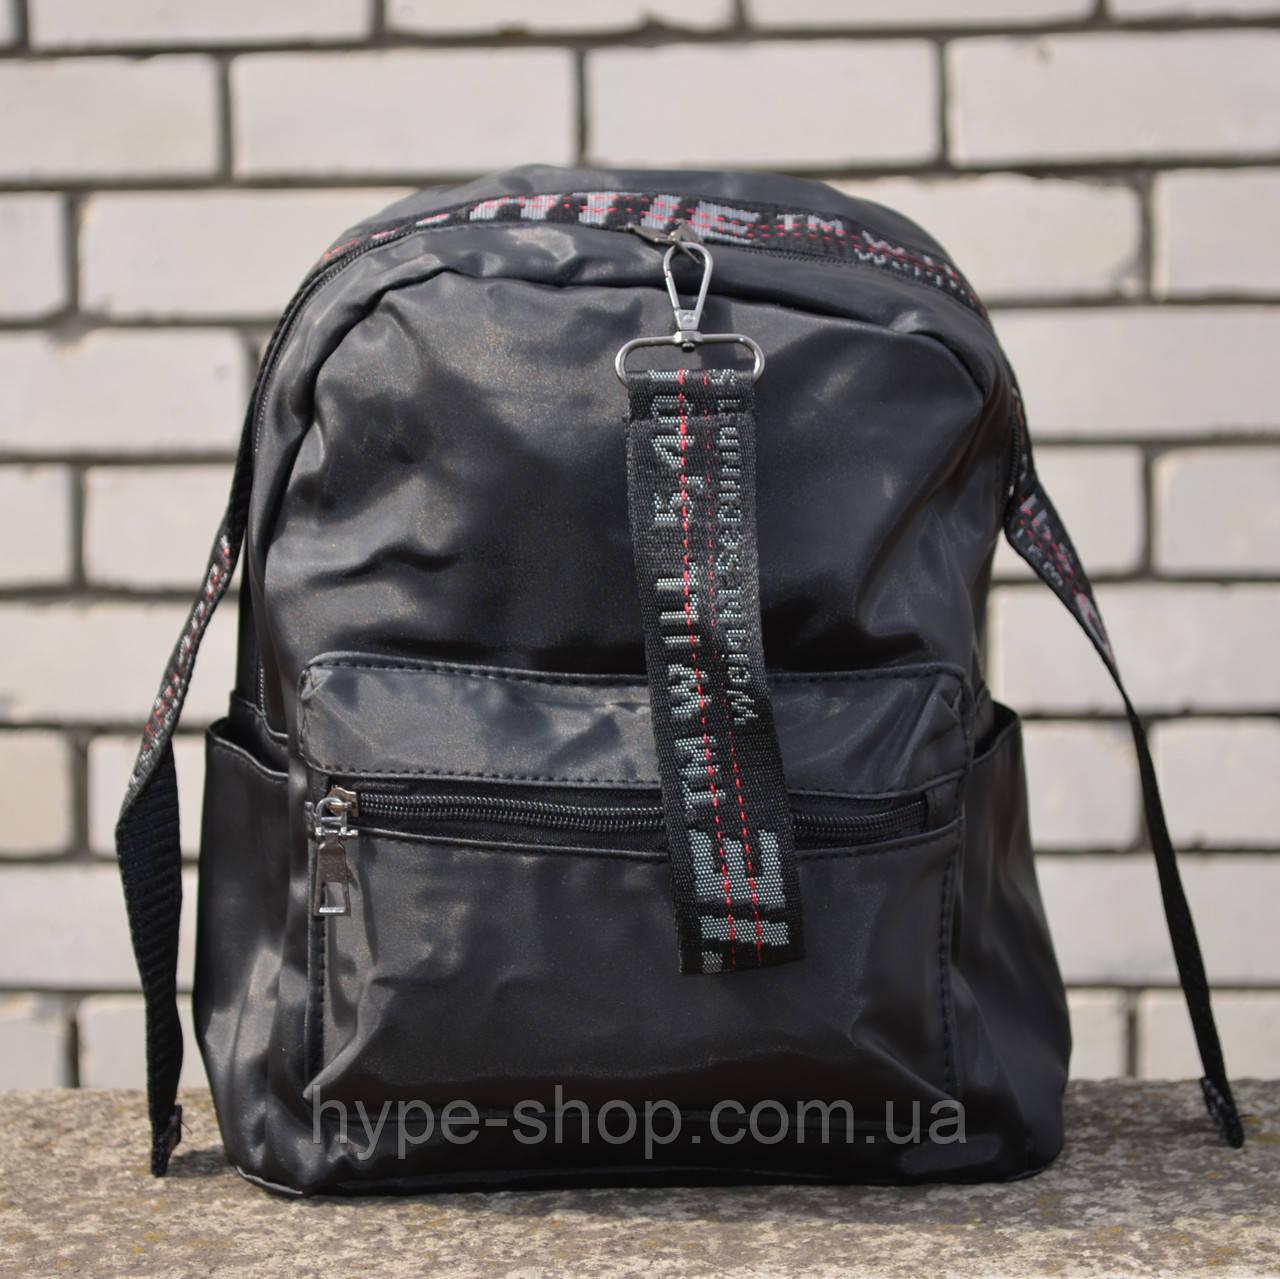 Рюкзак в стиле Off-White черный